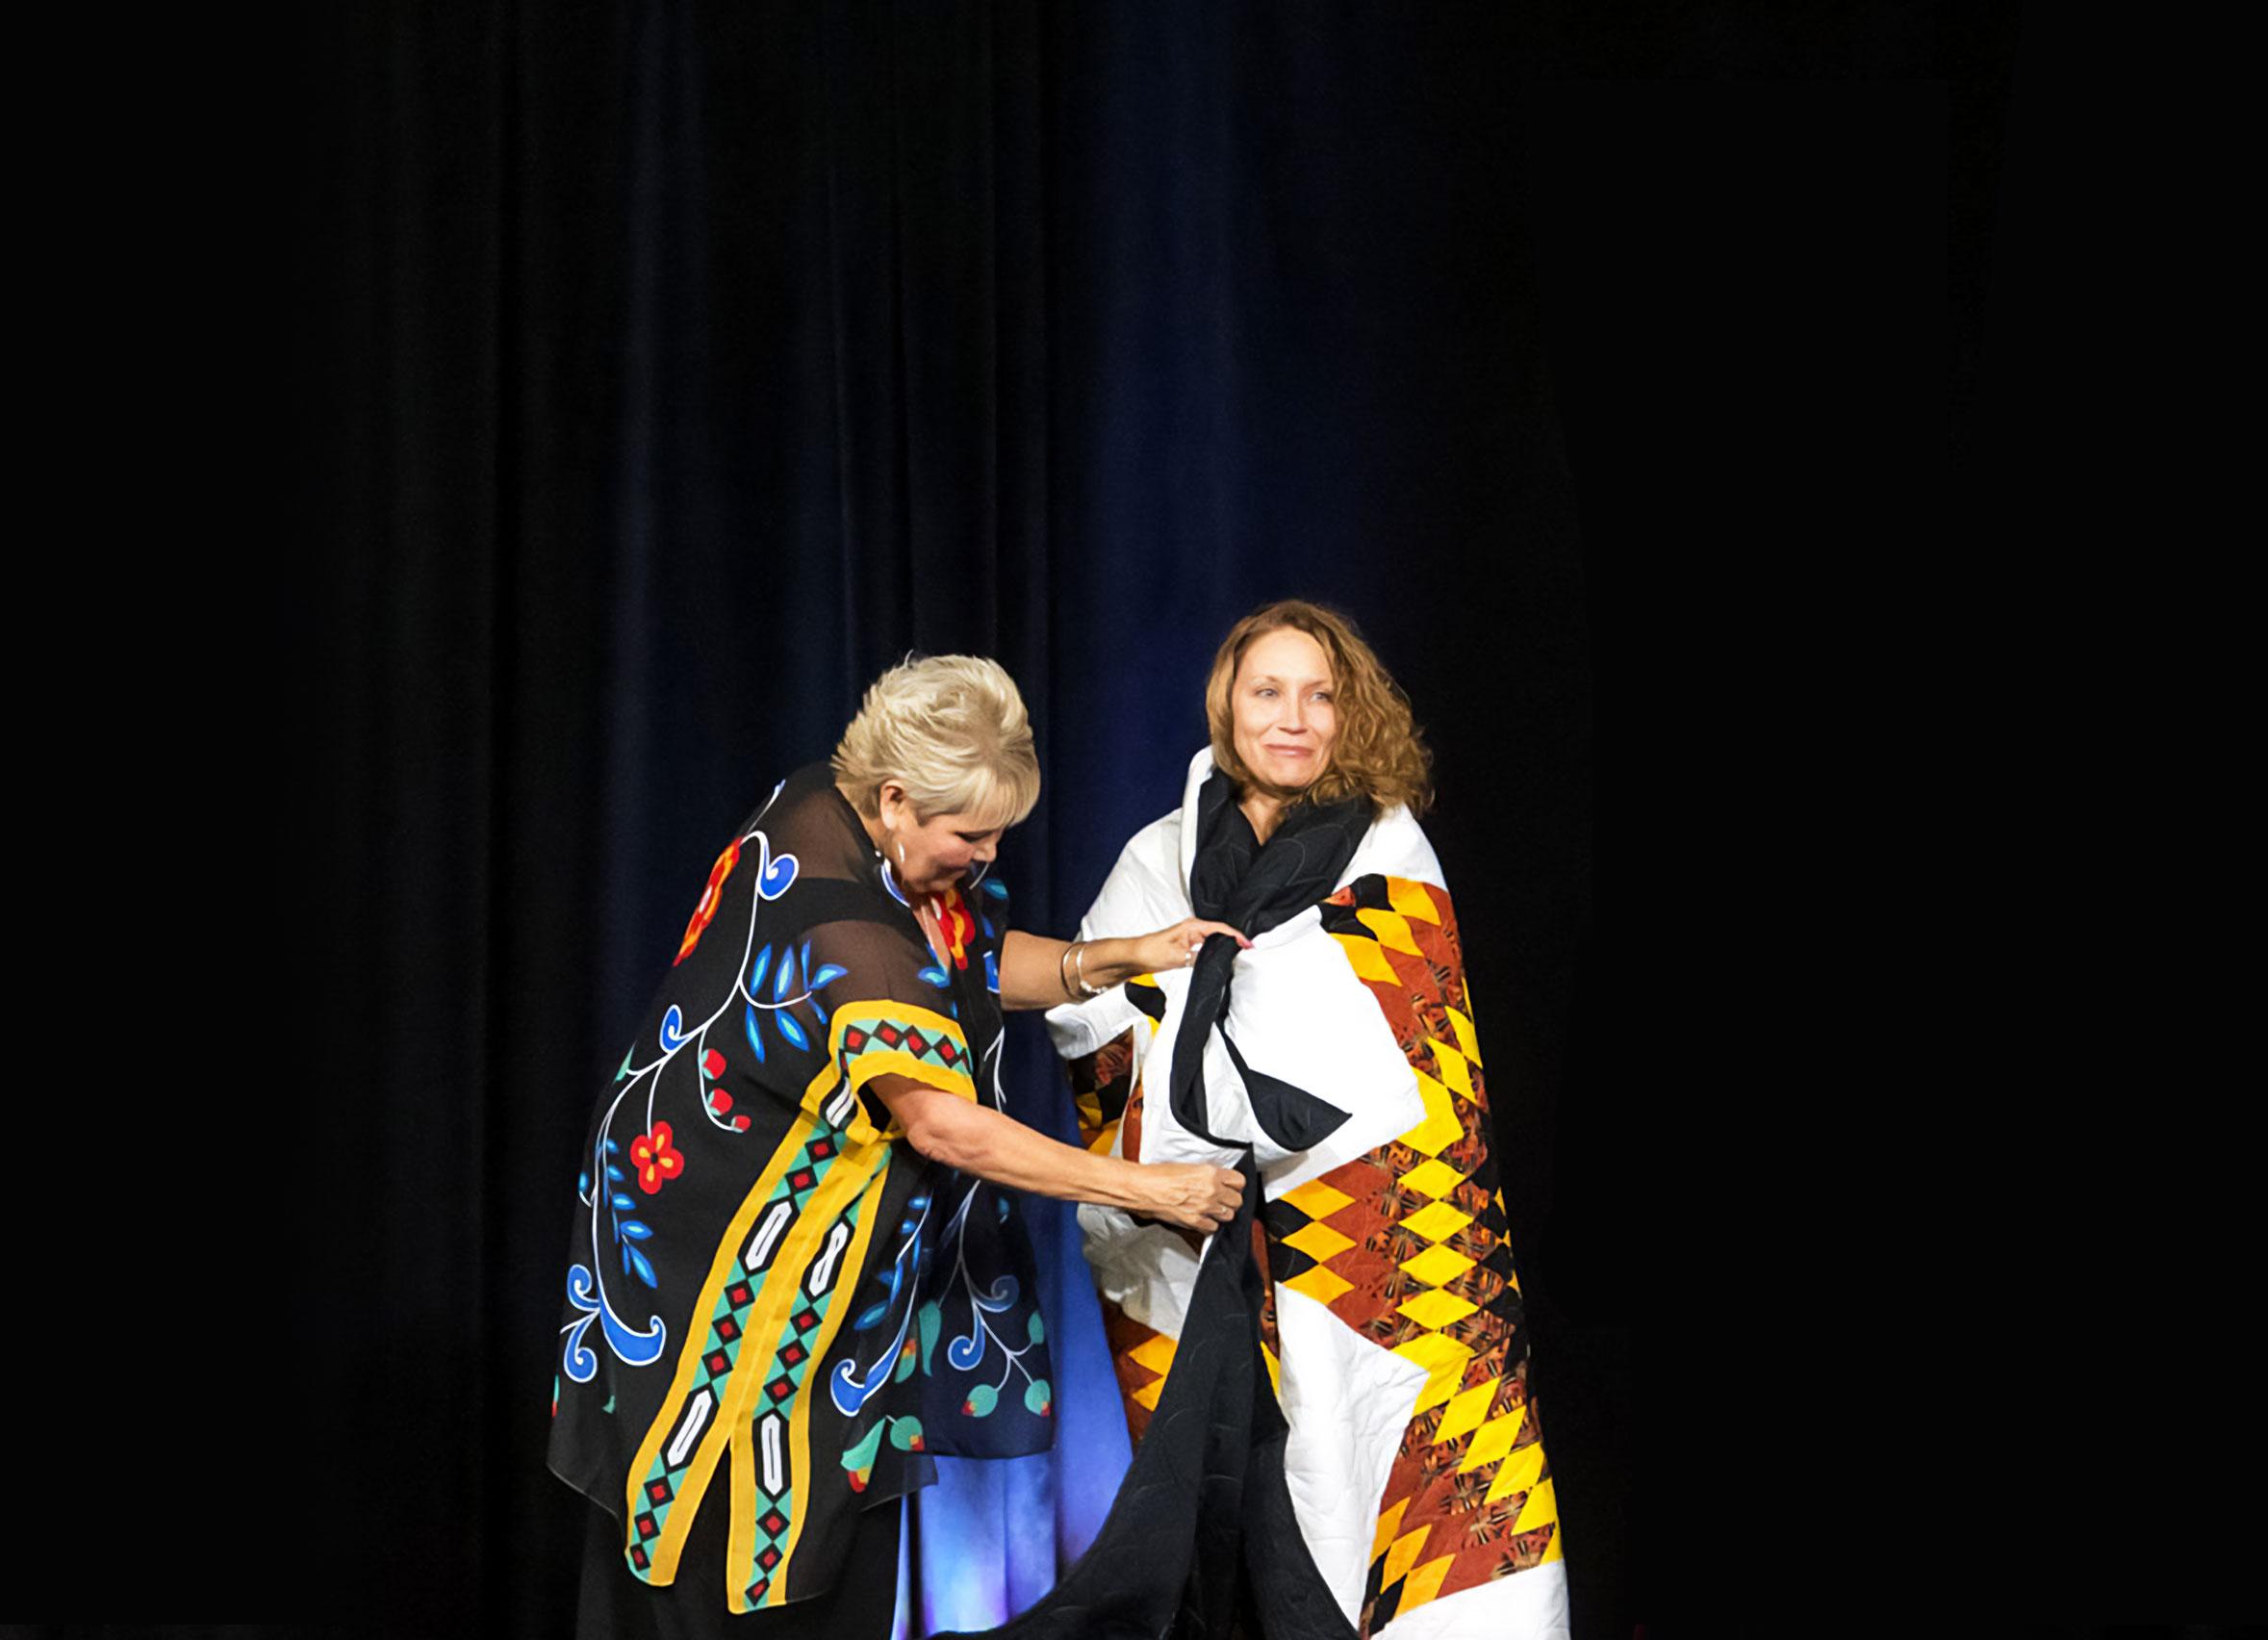 Sherry Ann McLennan & Merelda Fiddler-Potter